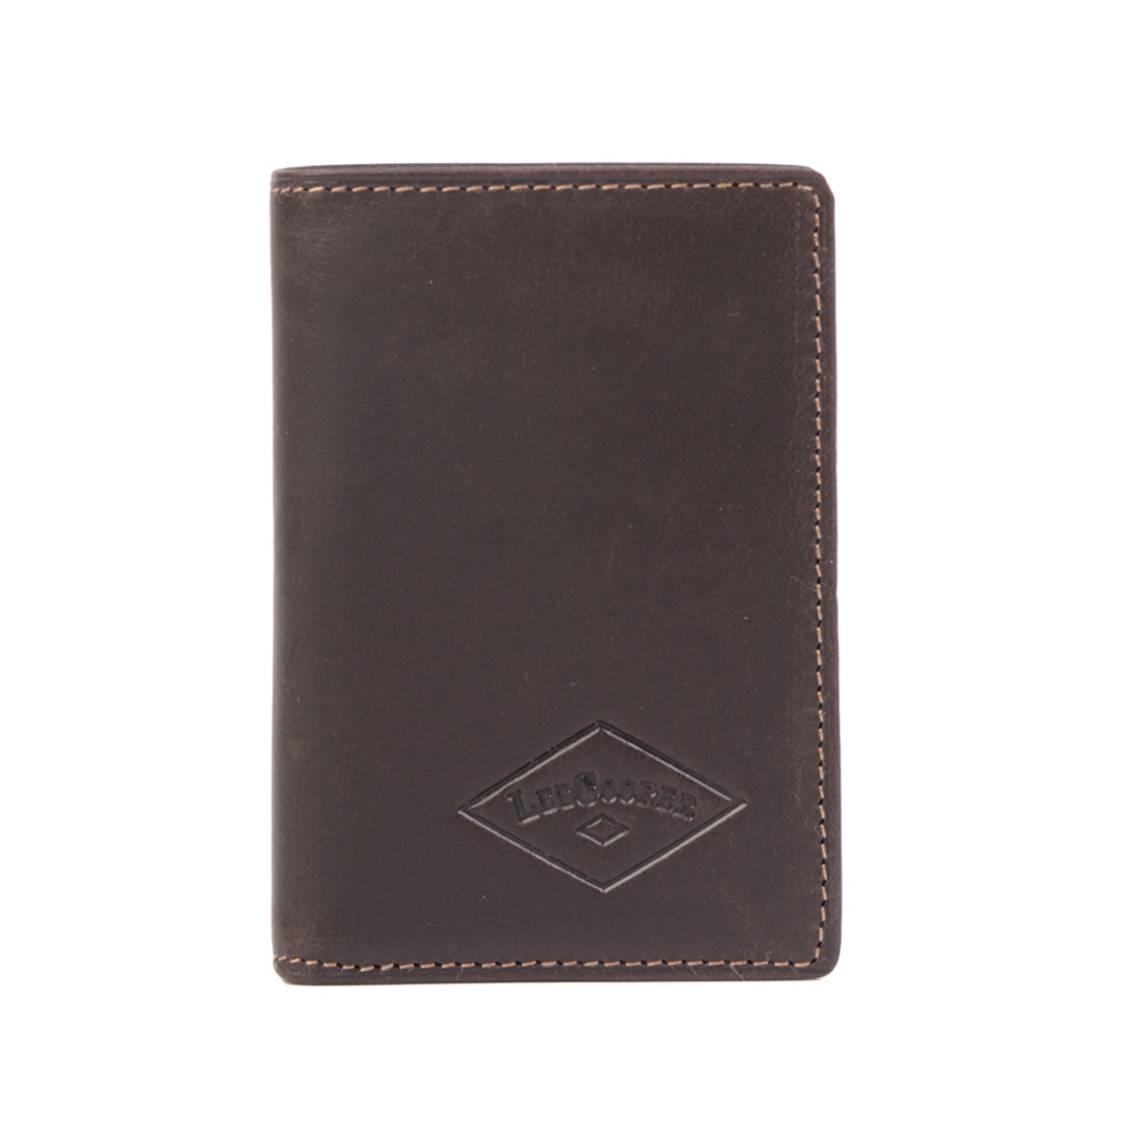 Porte-cartes LEE COOPER cuir marron xNc8G3s